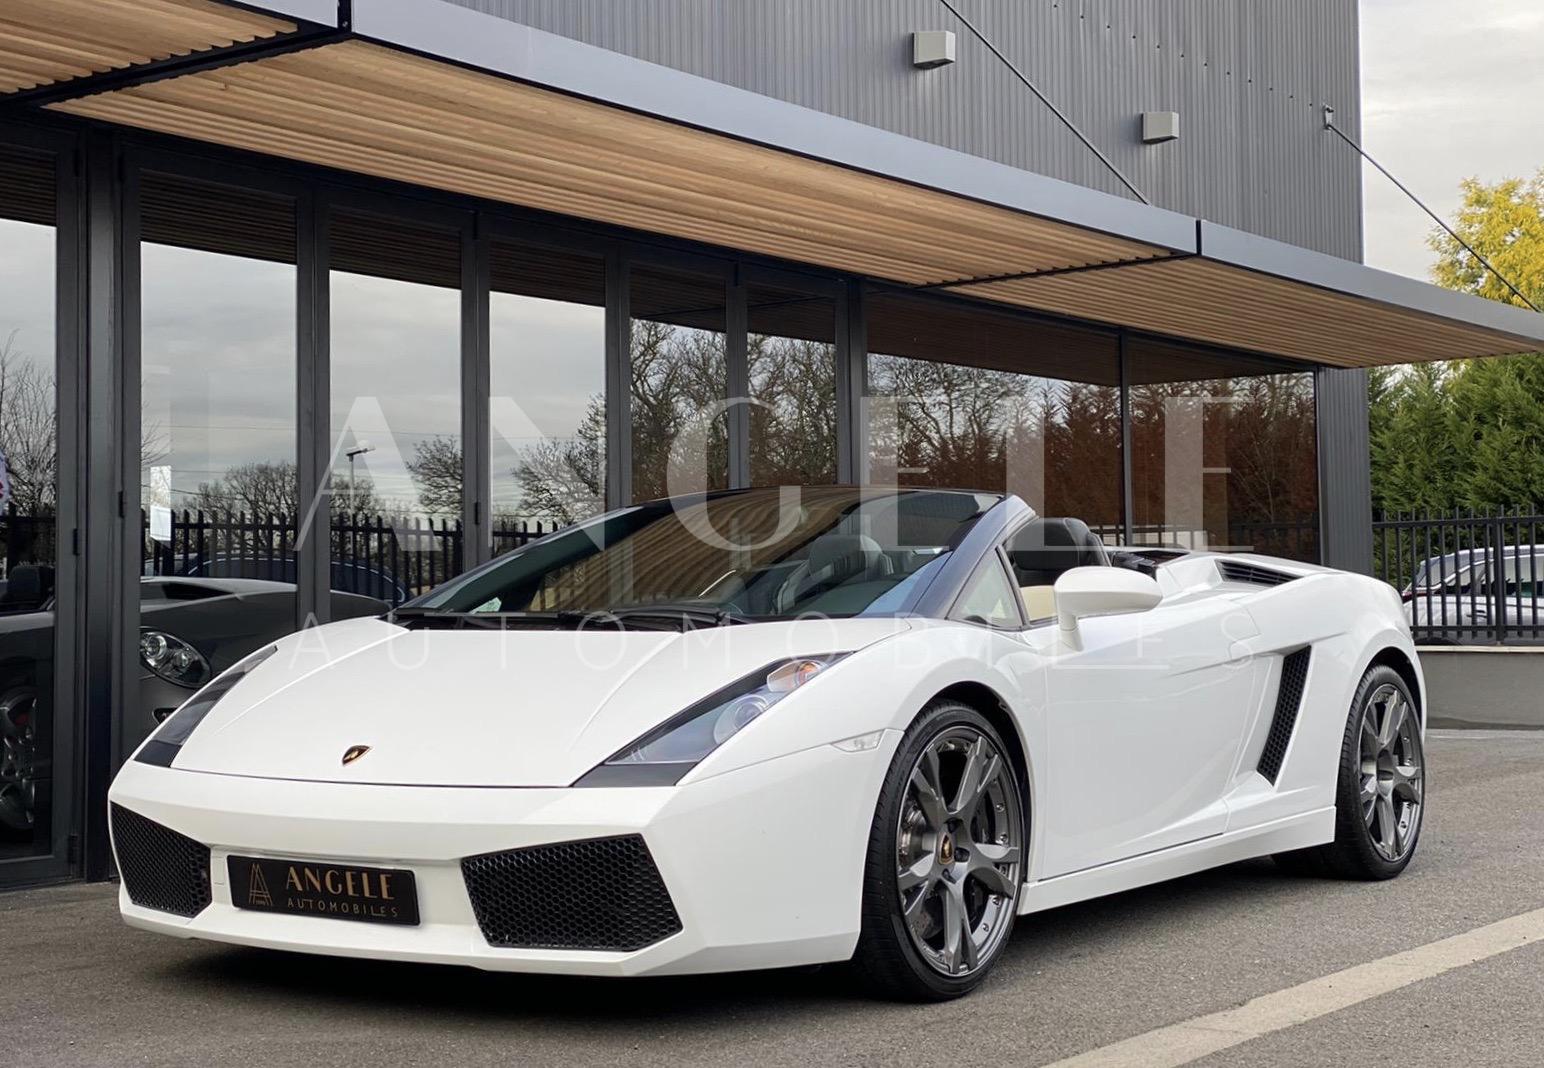 Lamborghini Gallardo Spyder - Angelé Automobiles